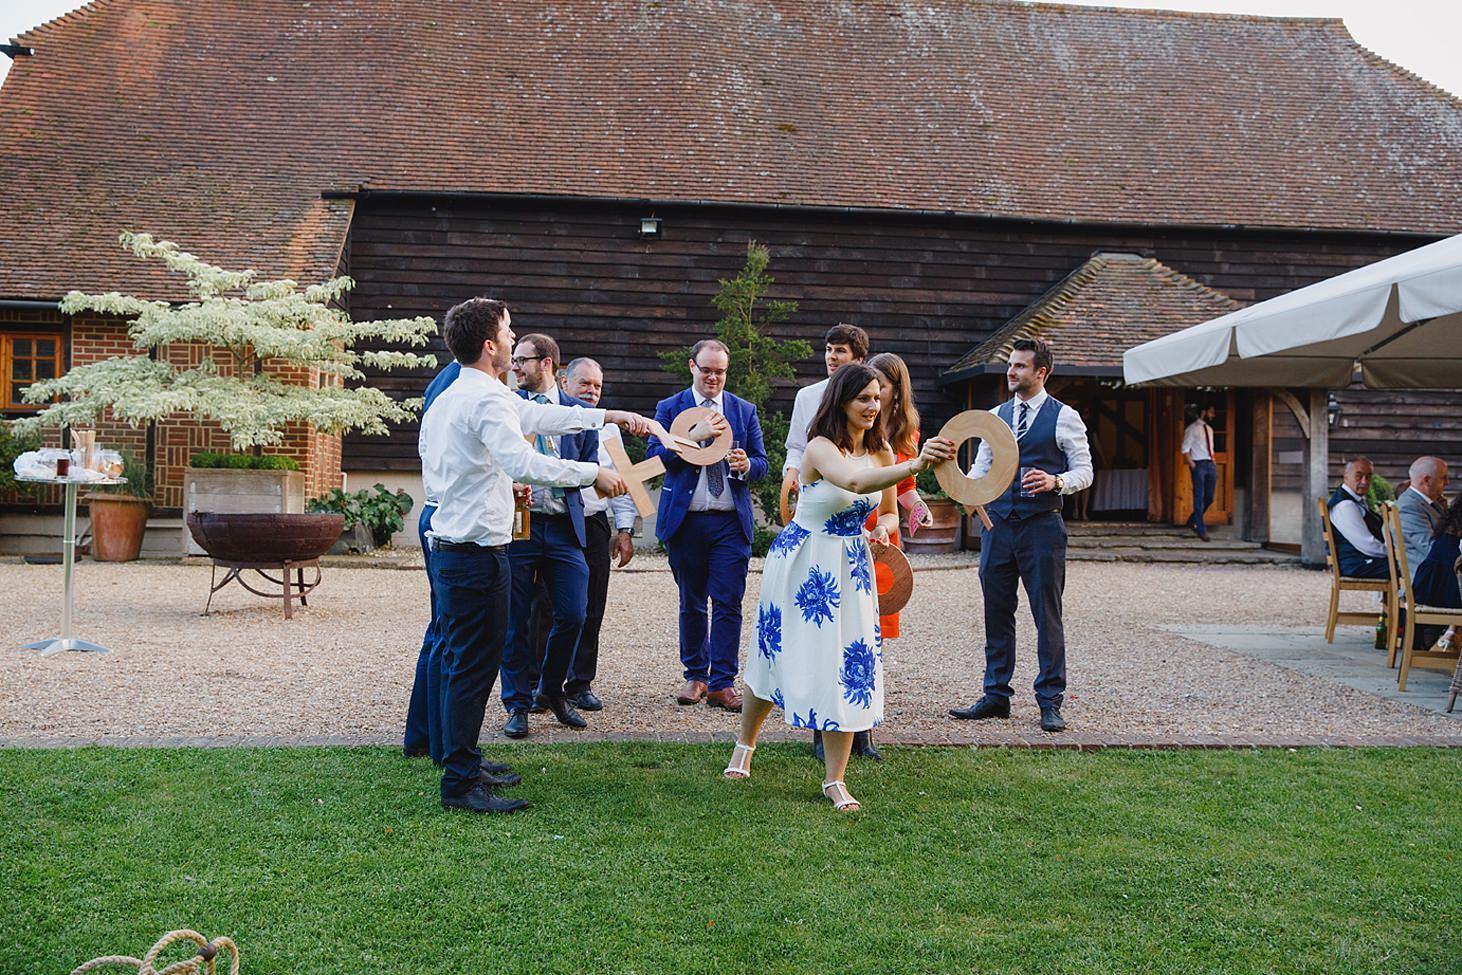 gate street barn wedding photography wedding guest throwing game